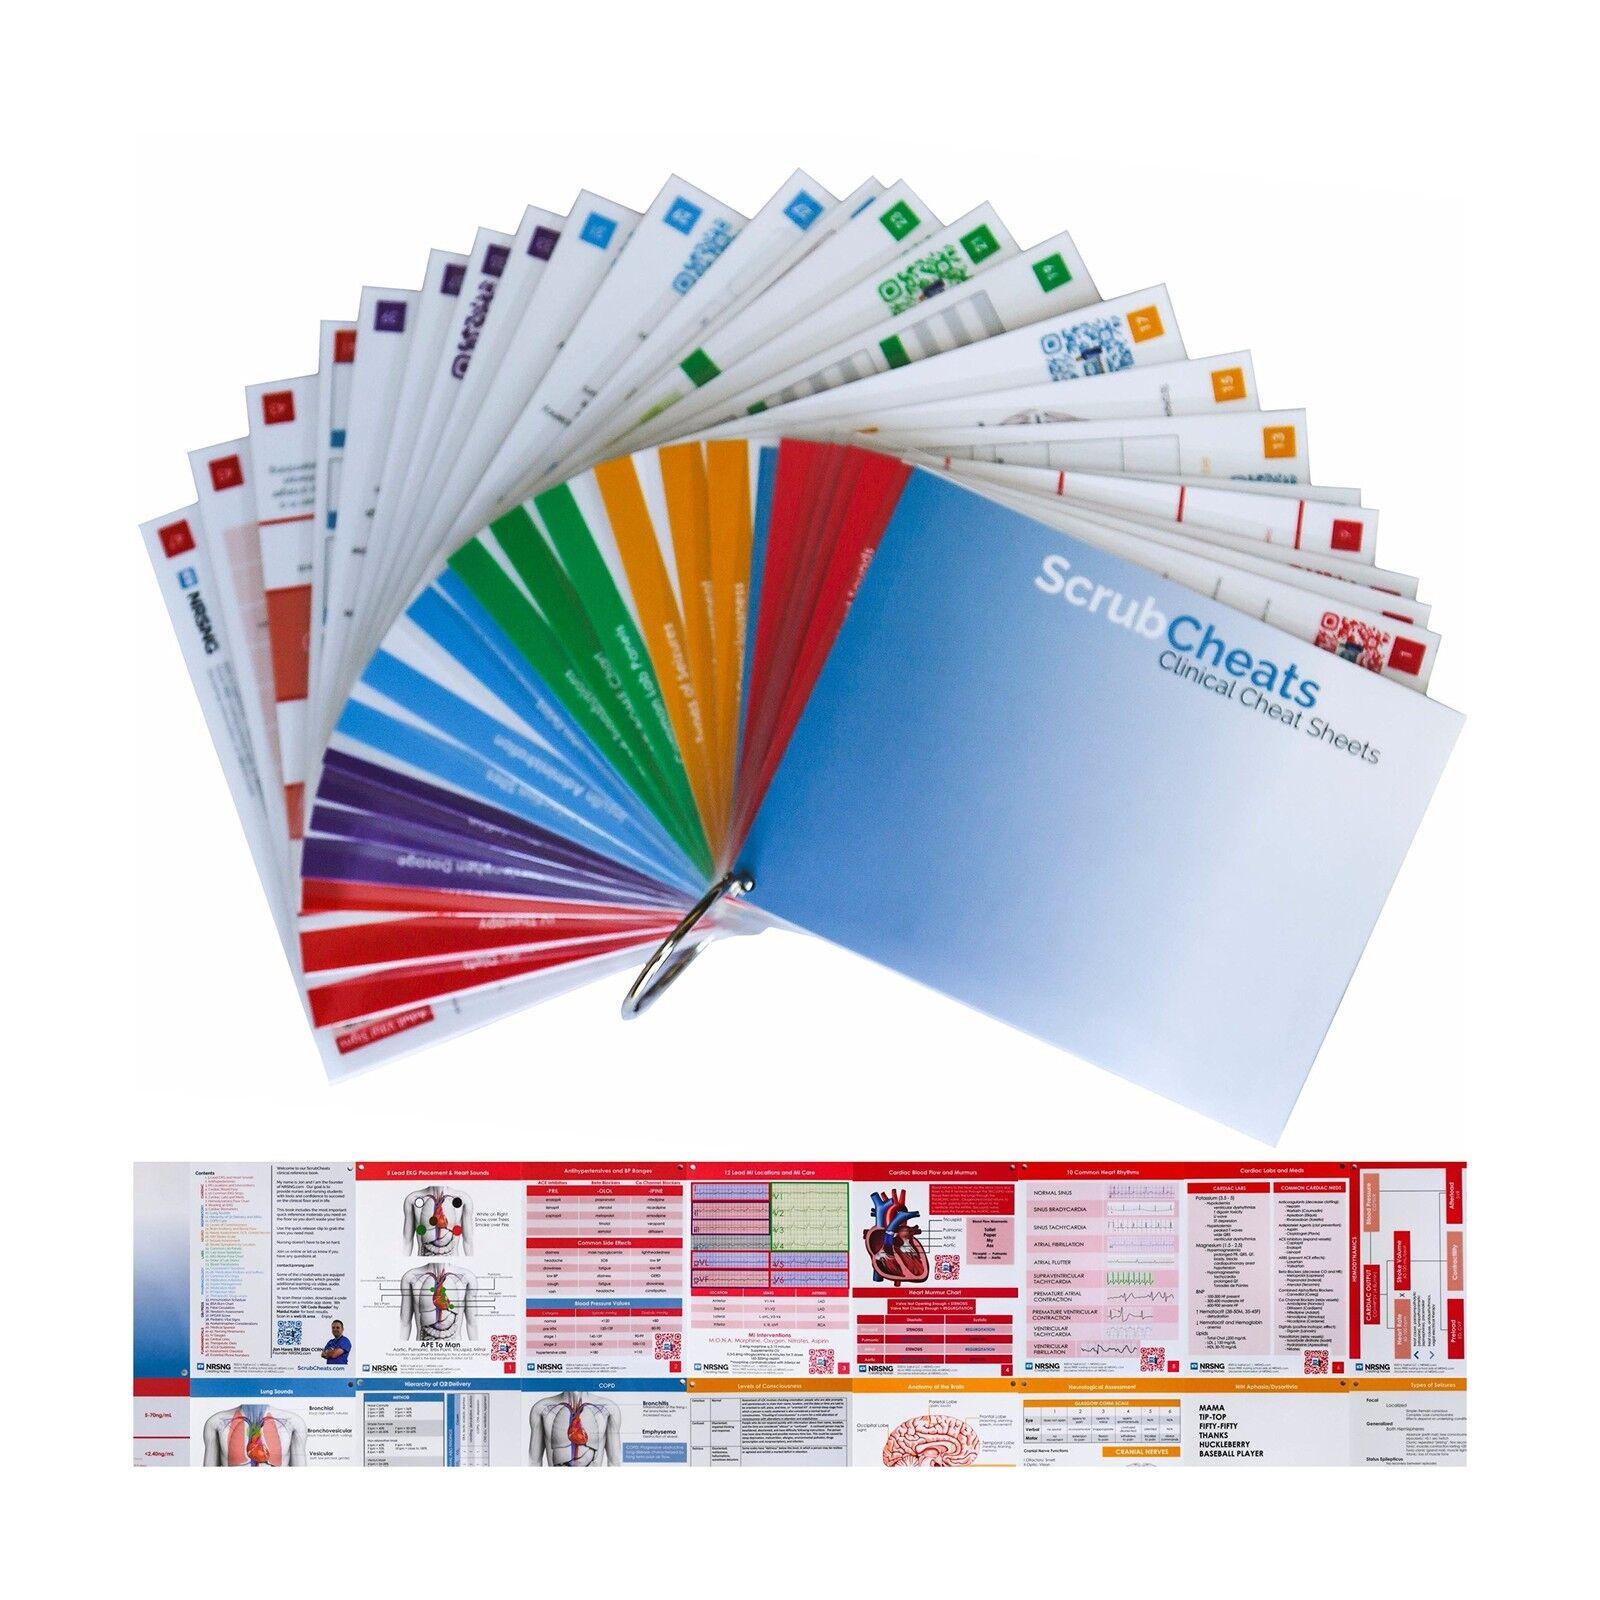 ScrubCheats 50 Nursing Reference Cards HEAVY Laminated Scannabl... Free Shipping